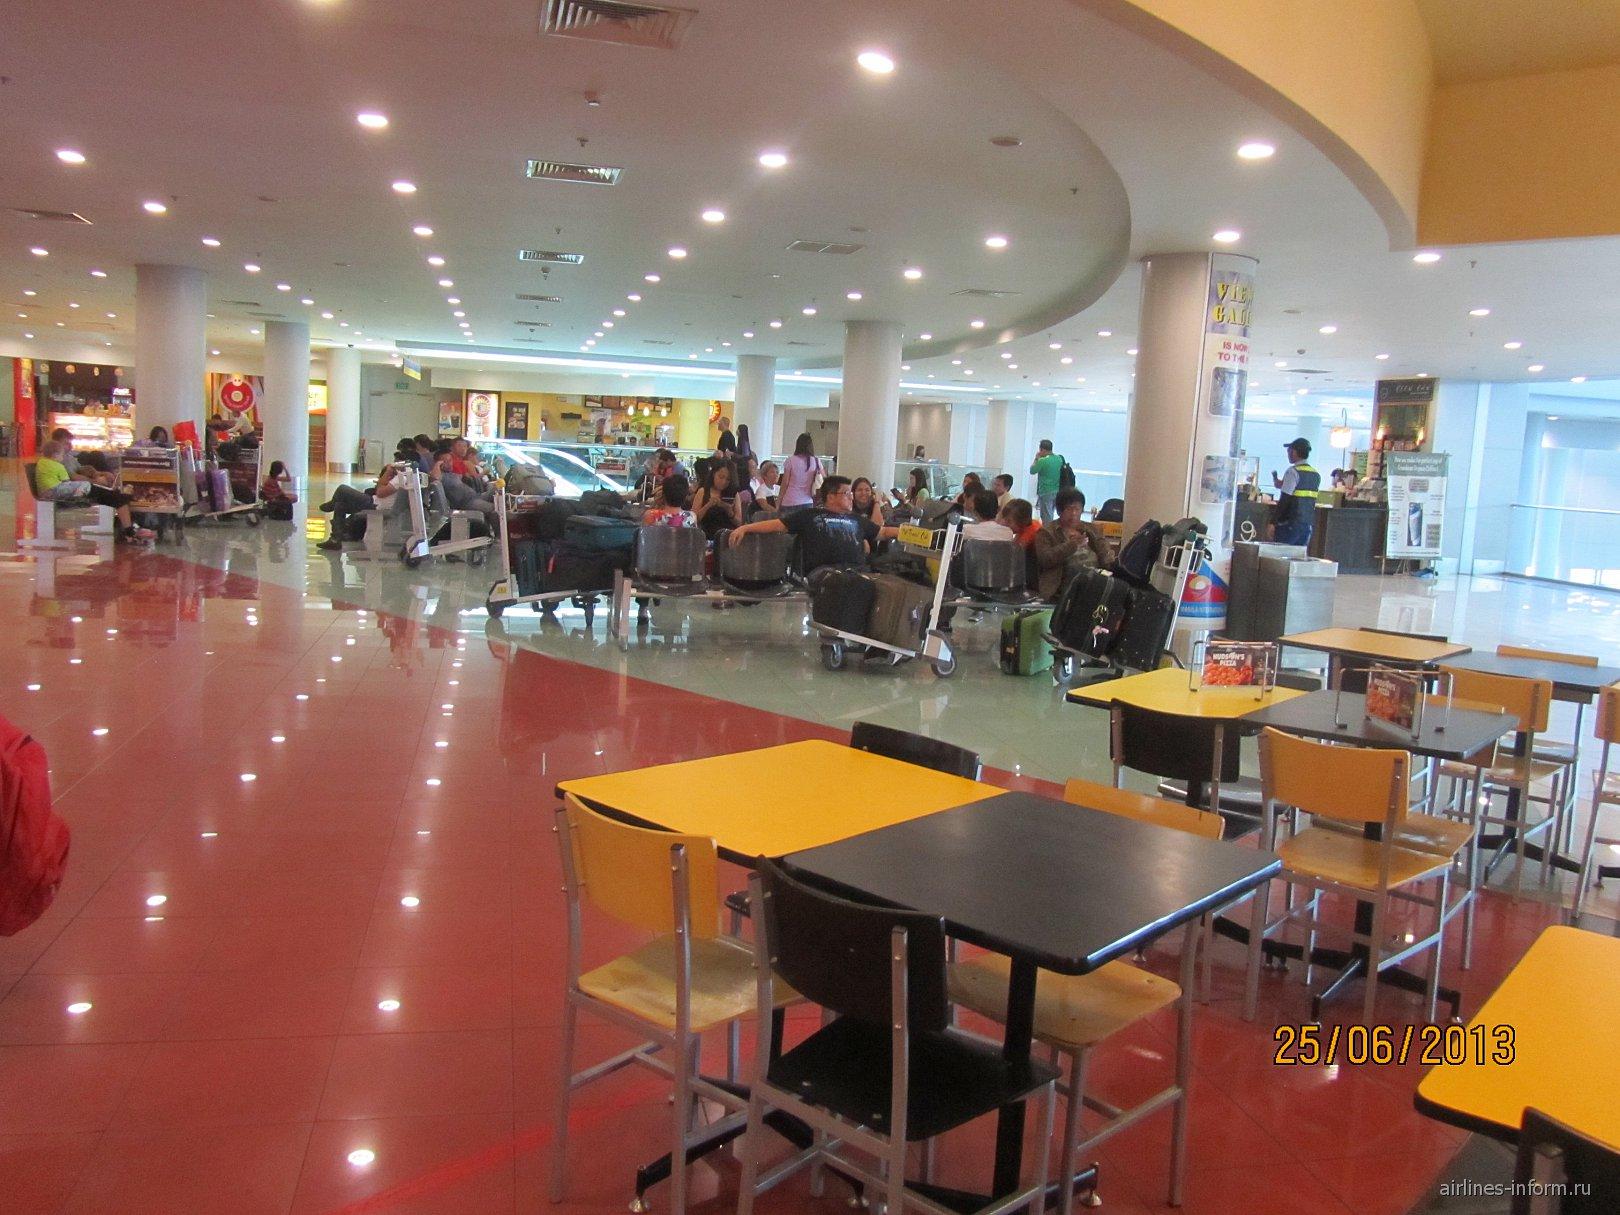 Зал ожидания в терминале Cebu Pacific в аэропорту Манилы аэропорту Манилы